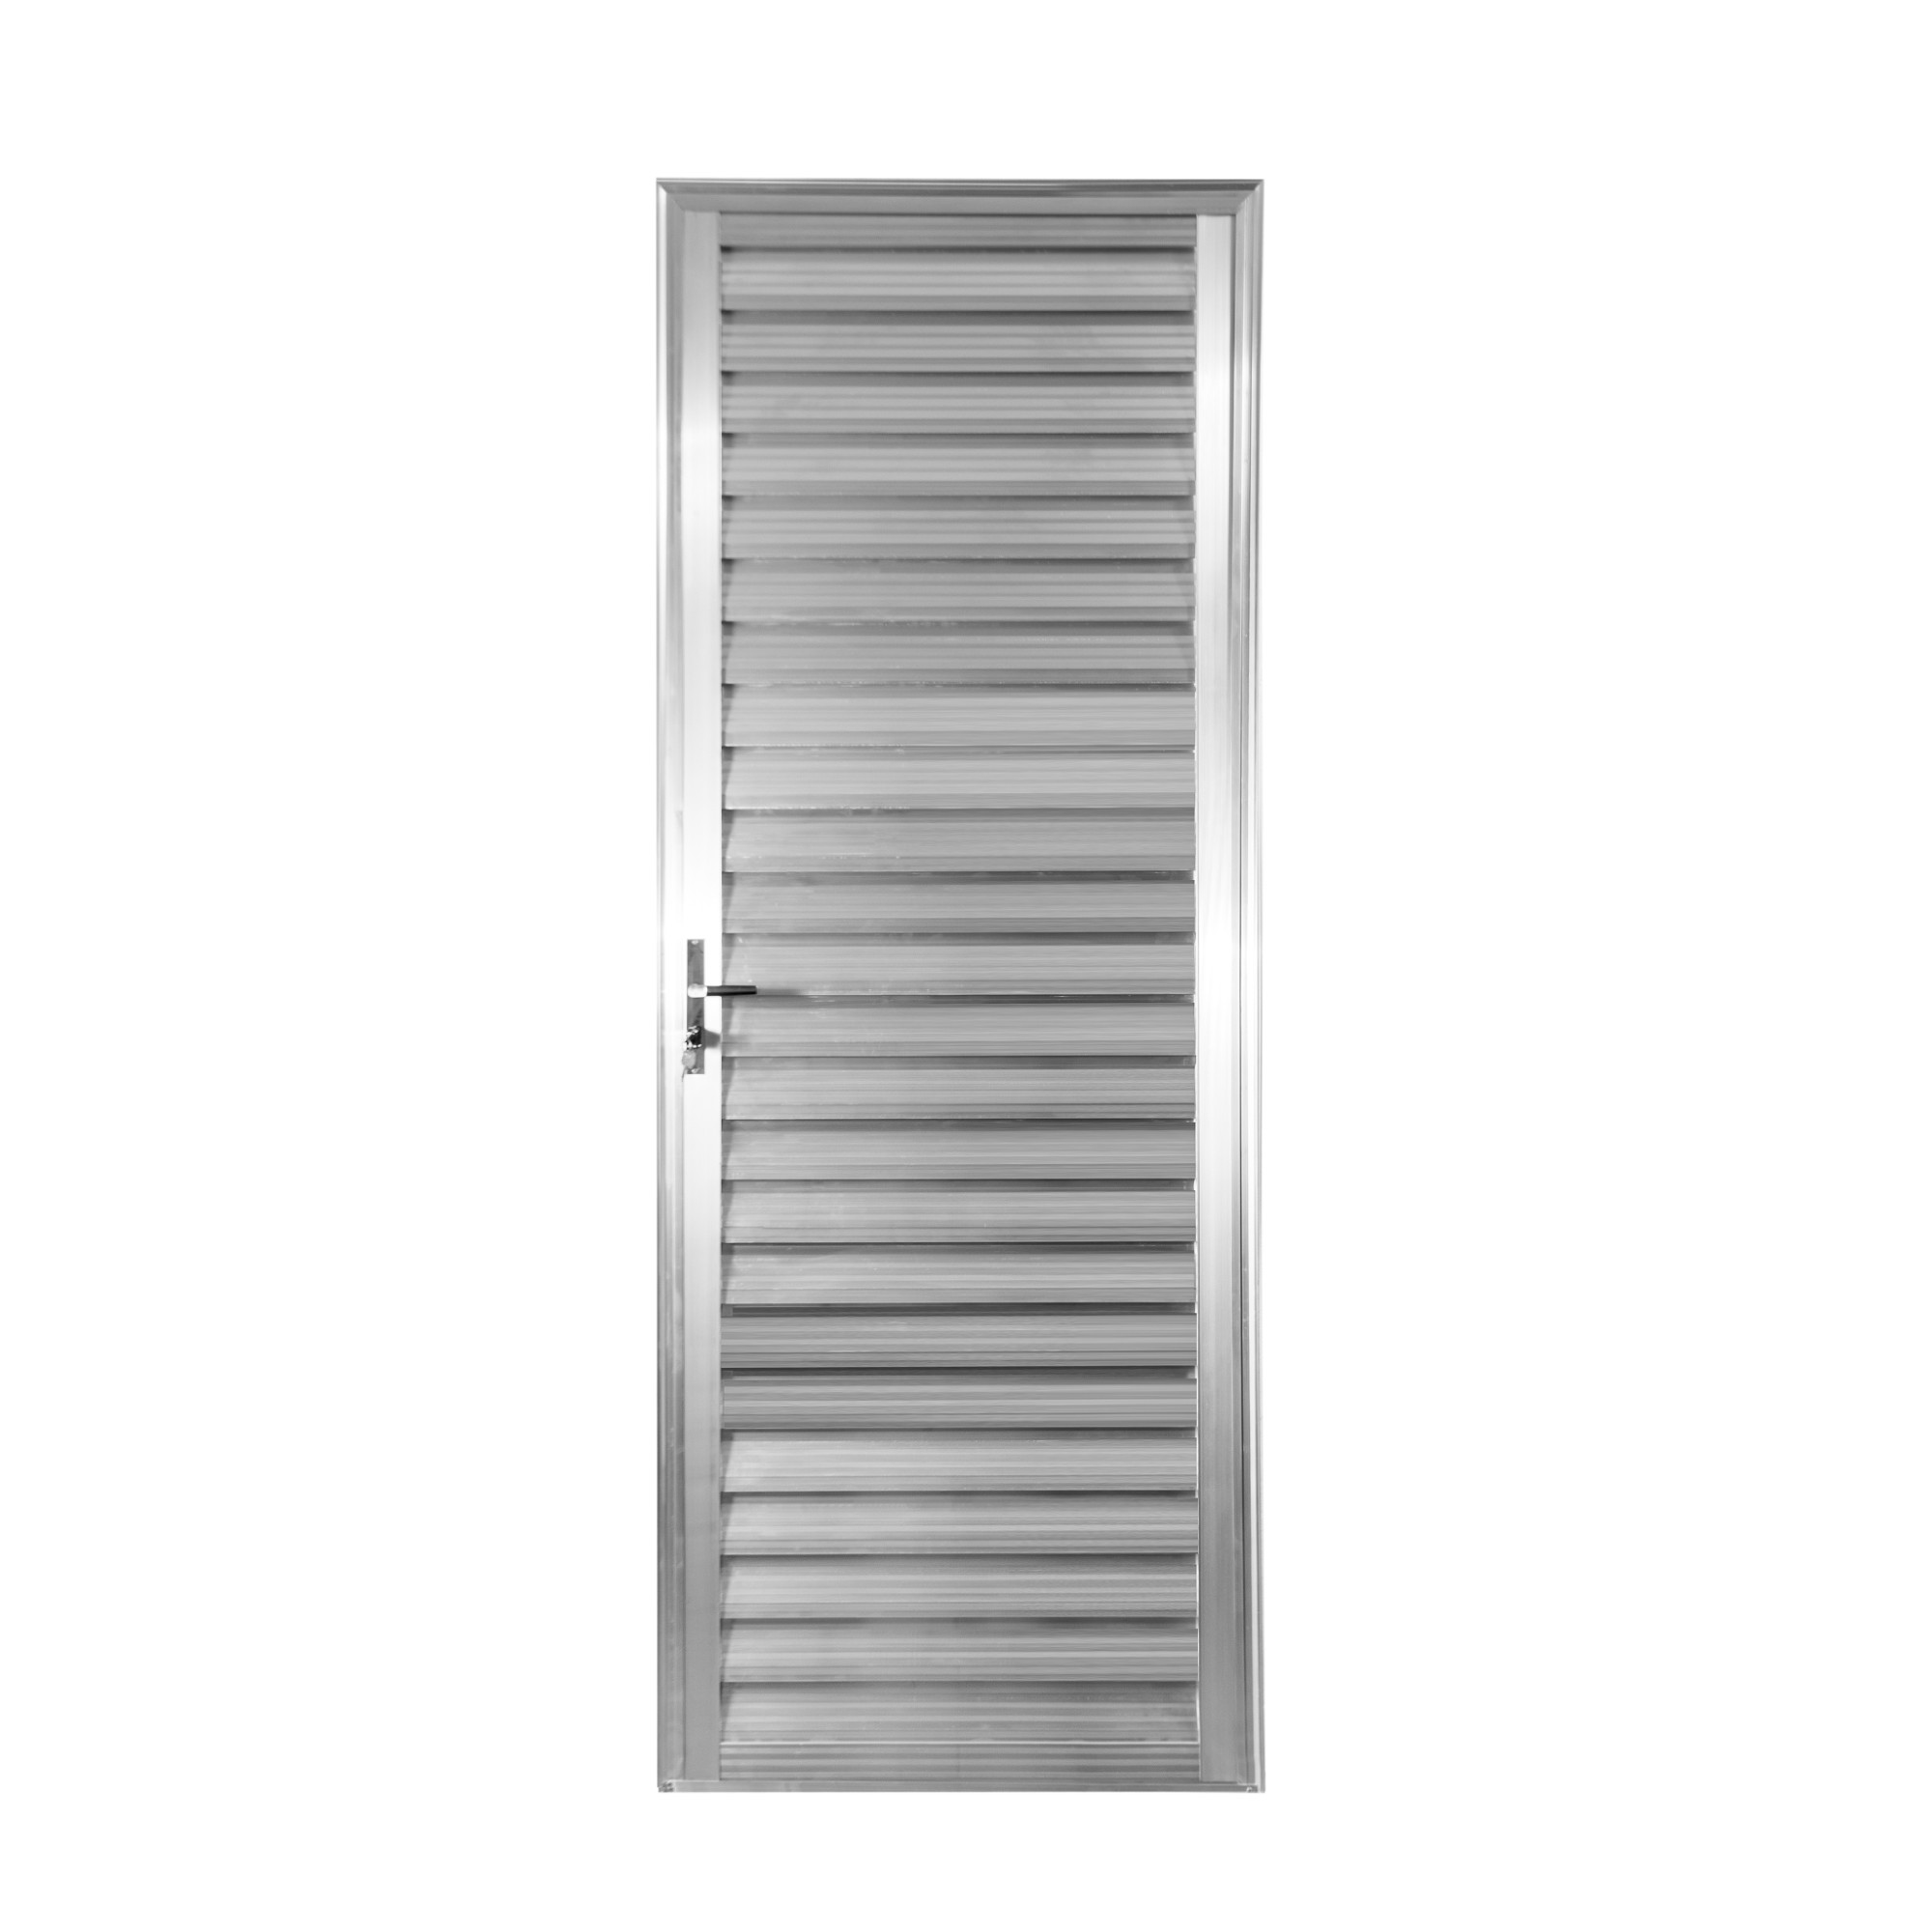 Porta de Abrir de Aluminio 210x80 cm Veneziana Lado Direito - Aluvid